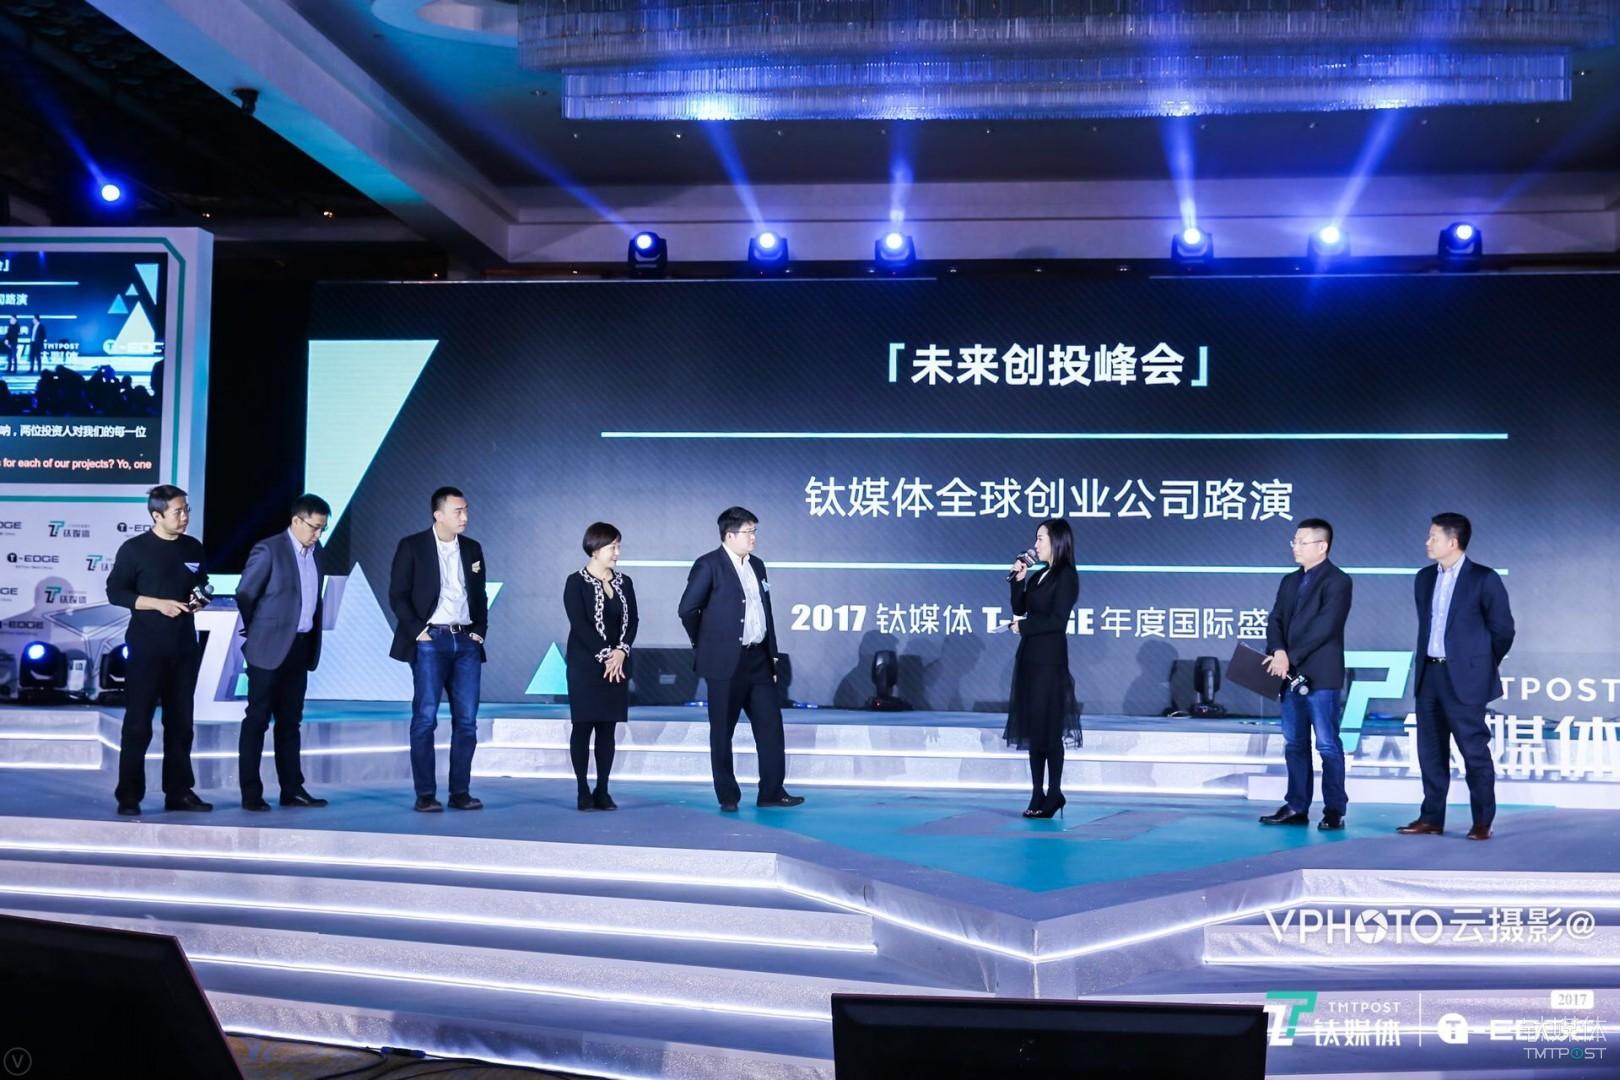 Fusion Fund创始合伙人张璐以及盛大资本执行董事陈明峰